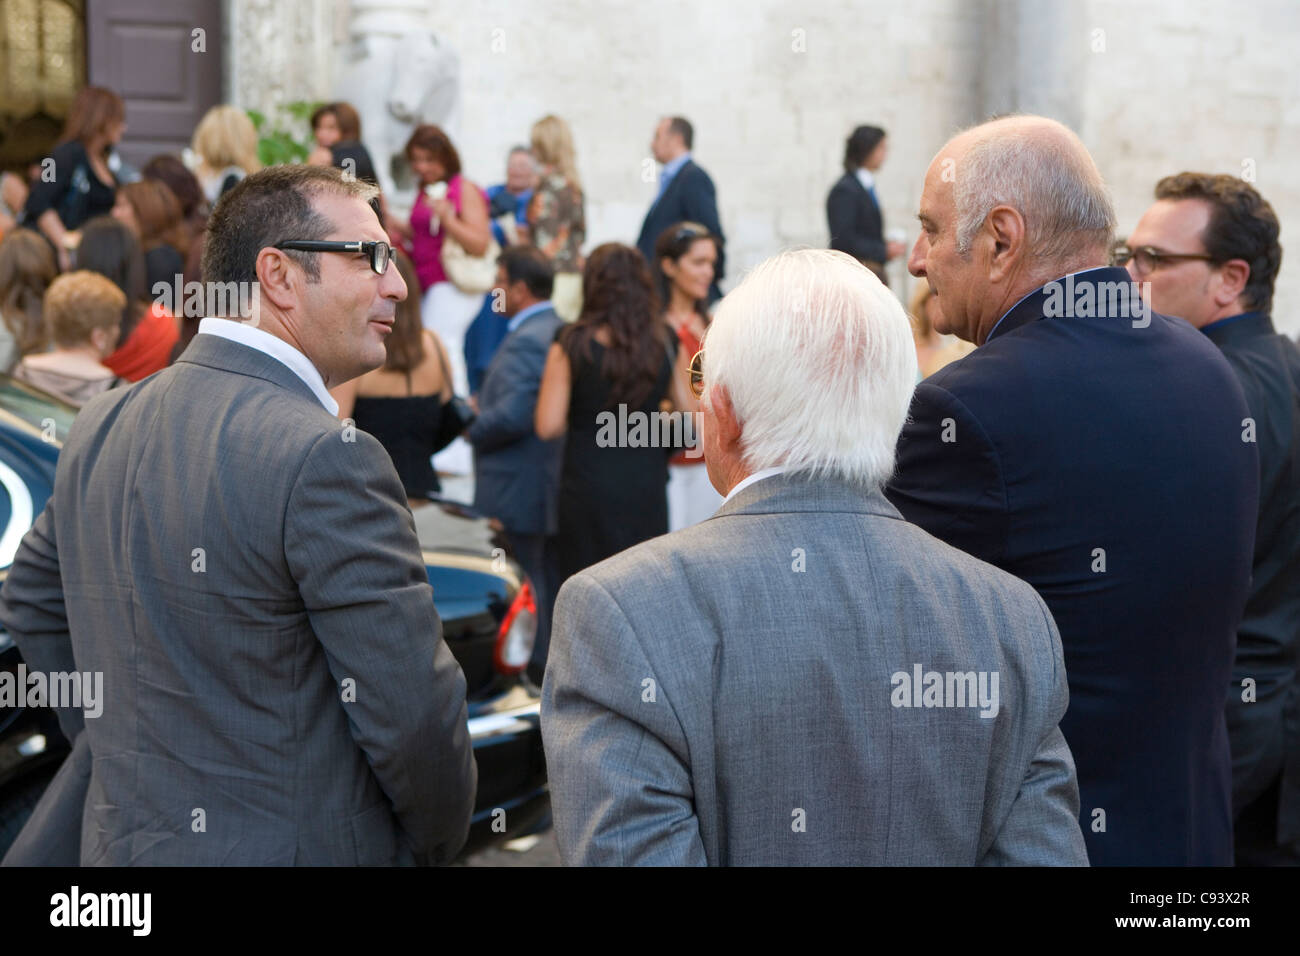 People gathered at a wedding outside San Nicola Basilica Bari Italy - Stock Image